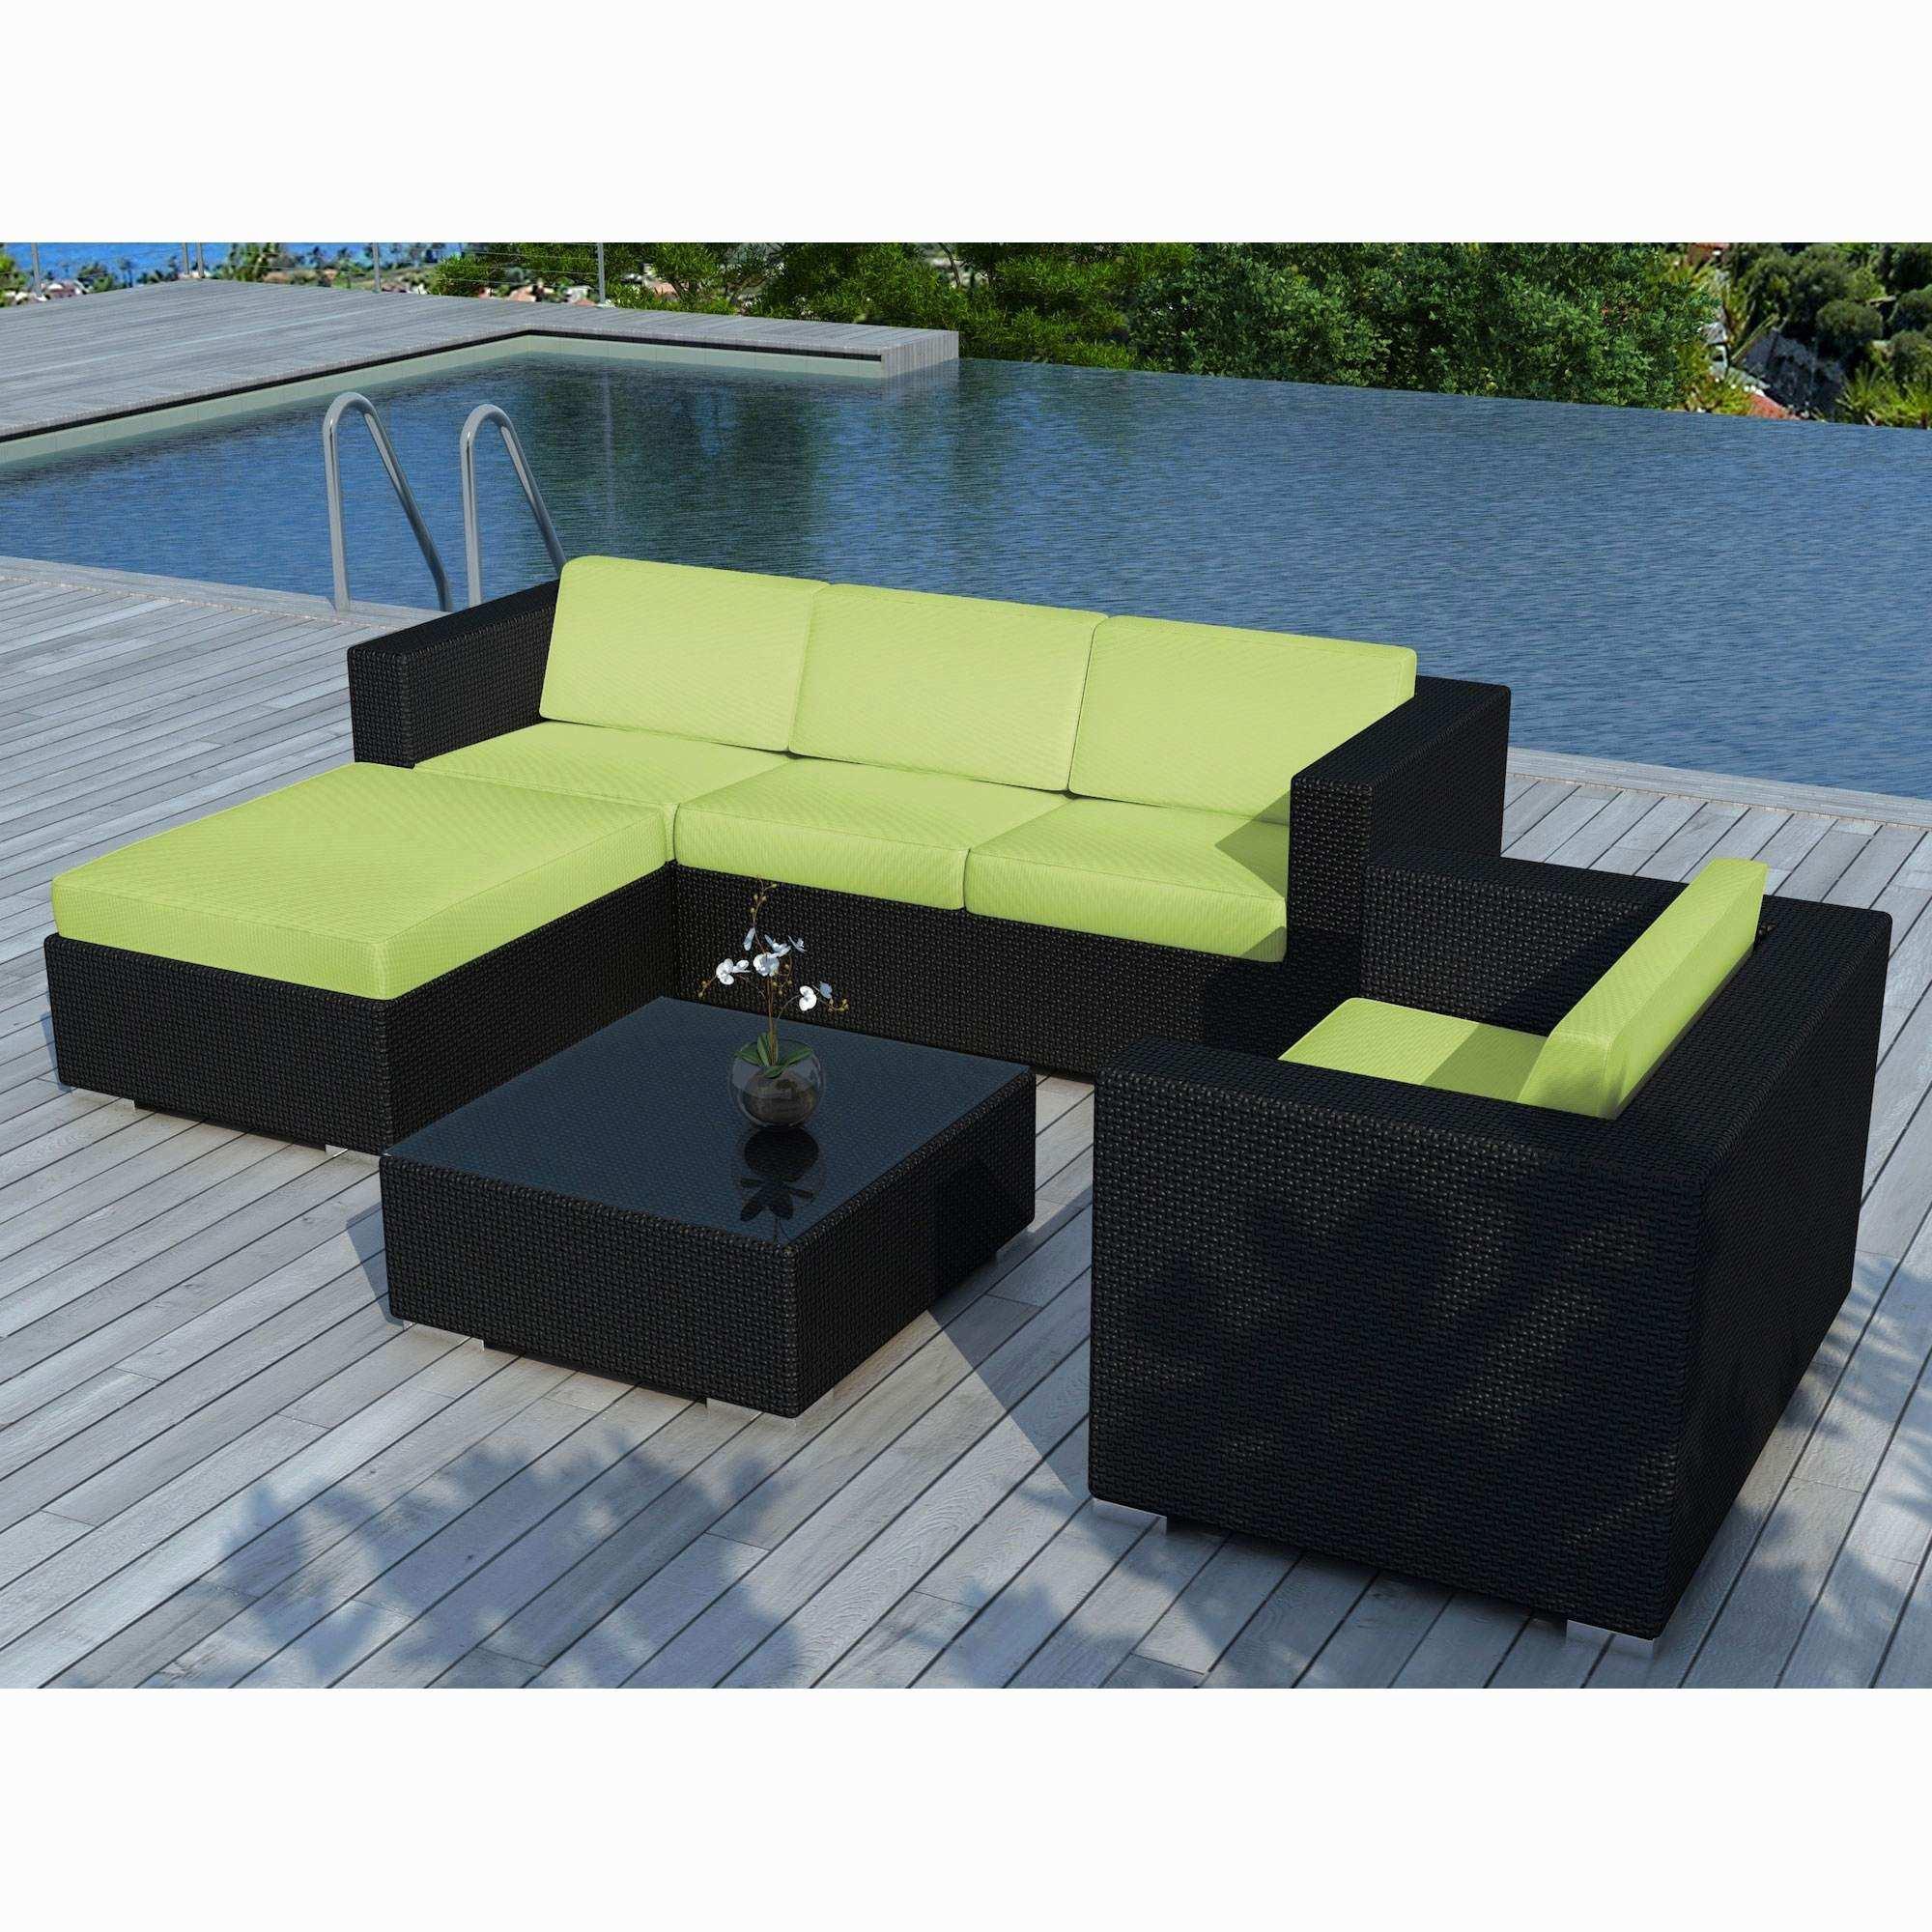 Chaise longue de jardin super u - veranda-styledevie.fr